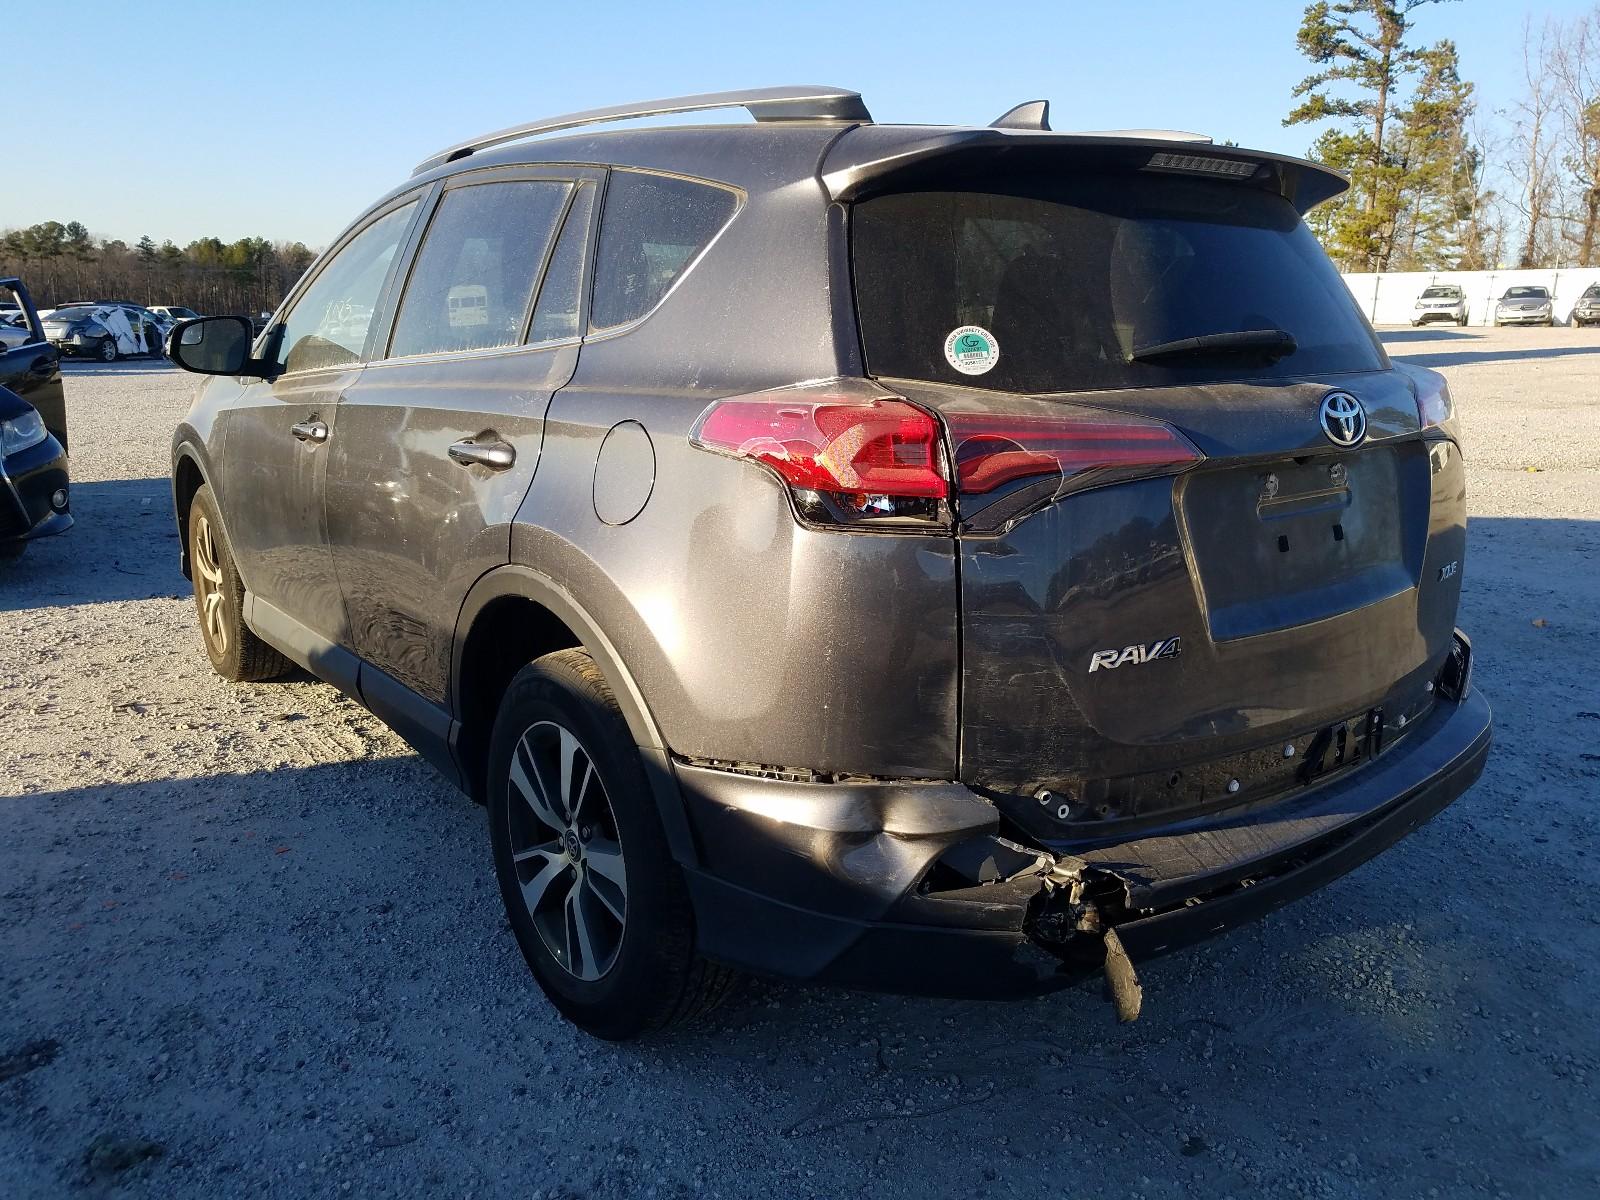 JTMWFREV7HD104796 - 2017 Toyota Rav4 Xle 2.5L [Angle] View